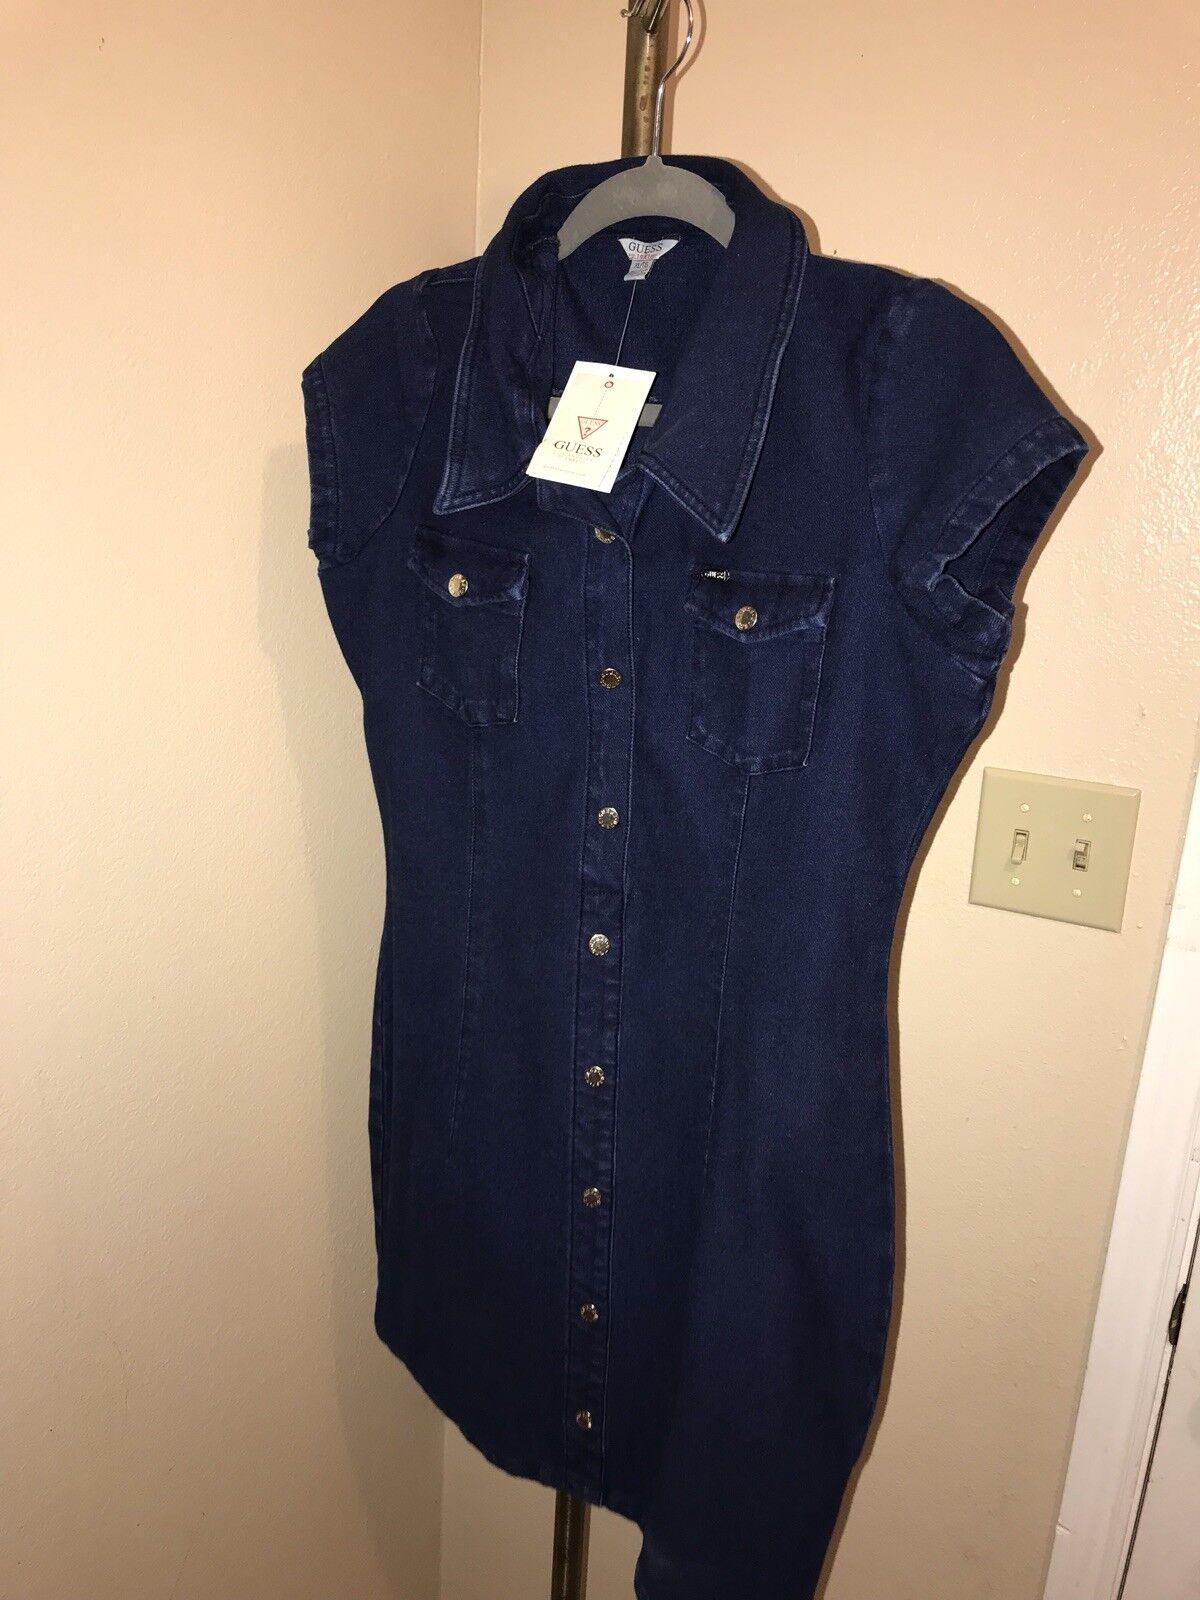 GUESS ARABELLE KNITDIGO DRESS XL